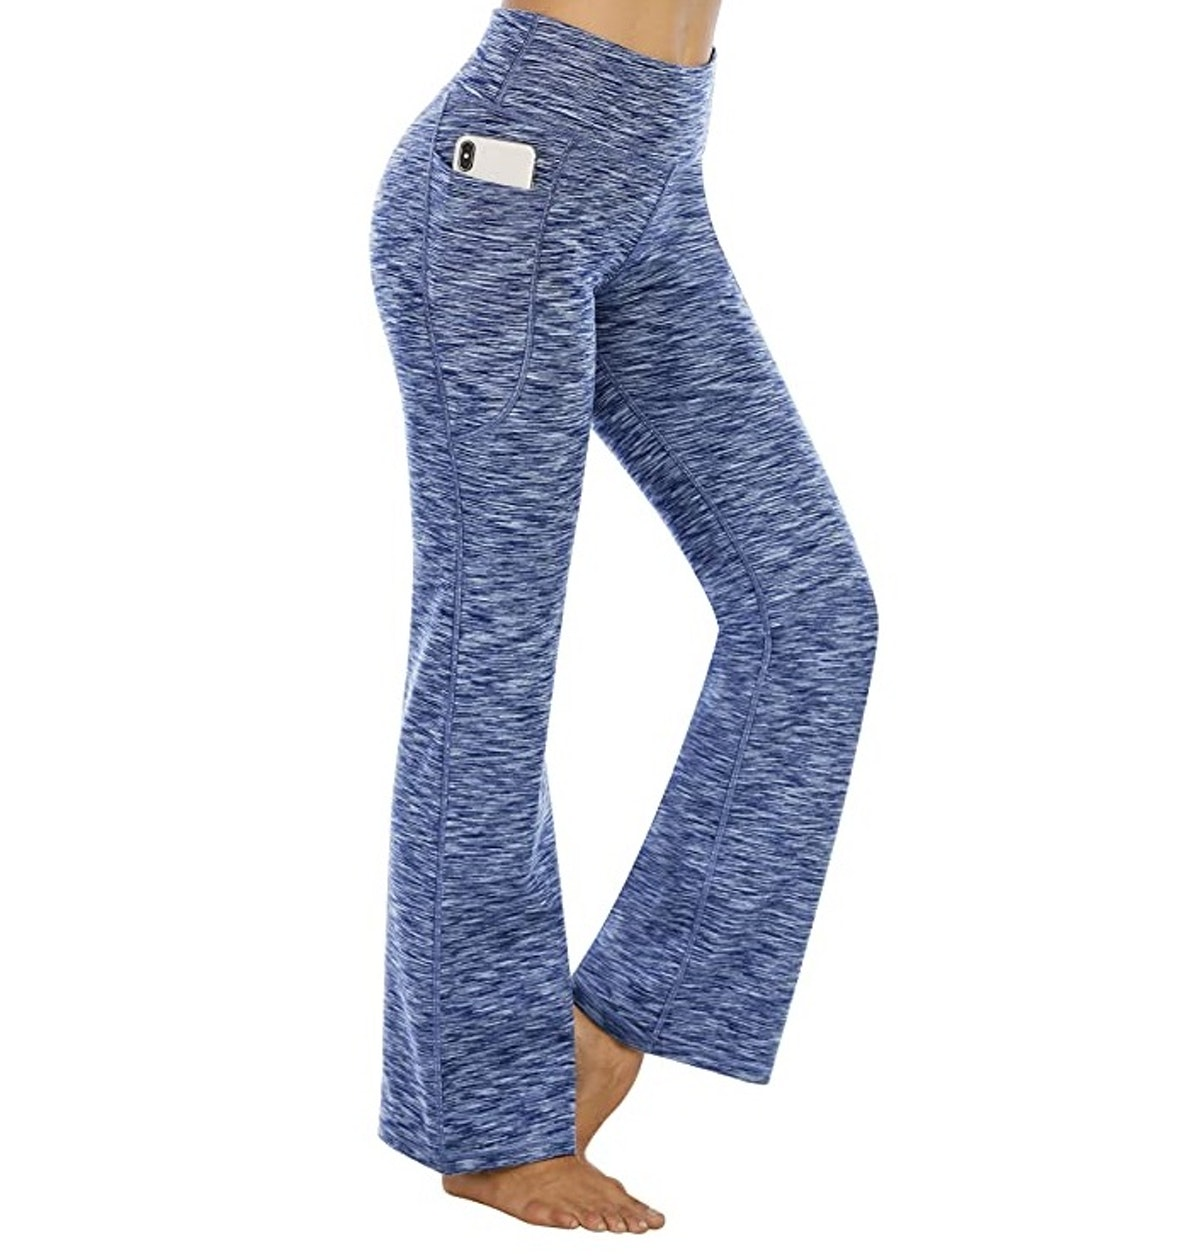 Heathyoga Bootcut Yoga Pants